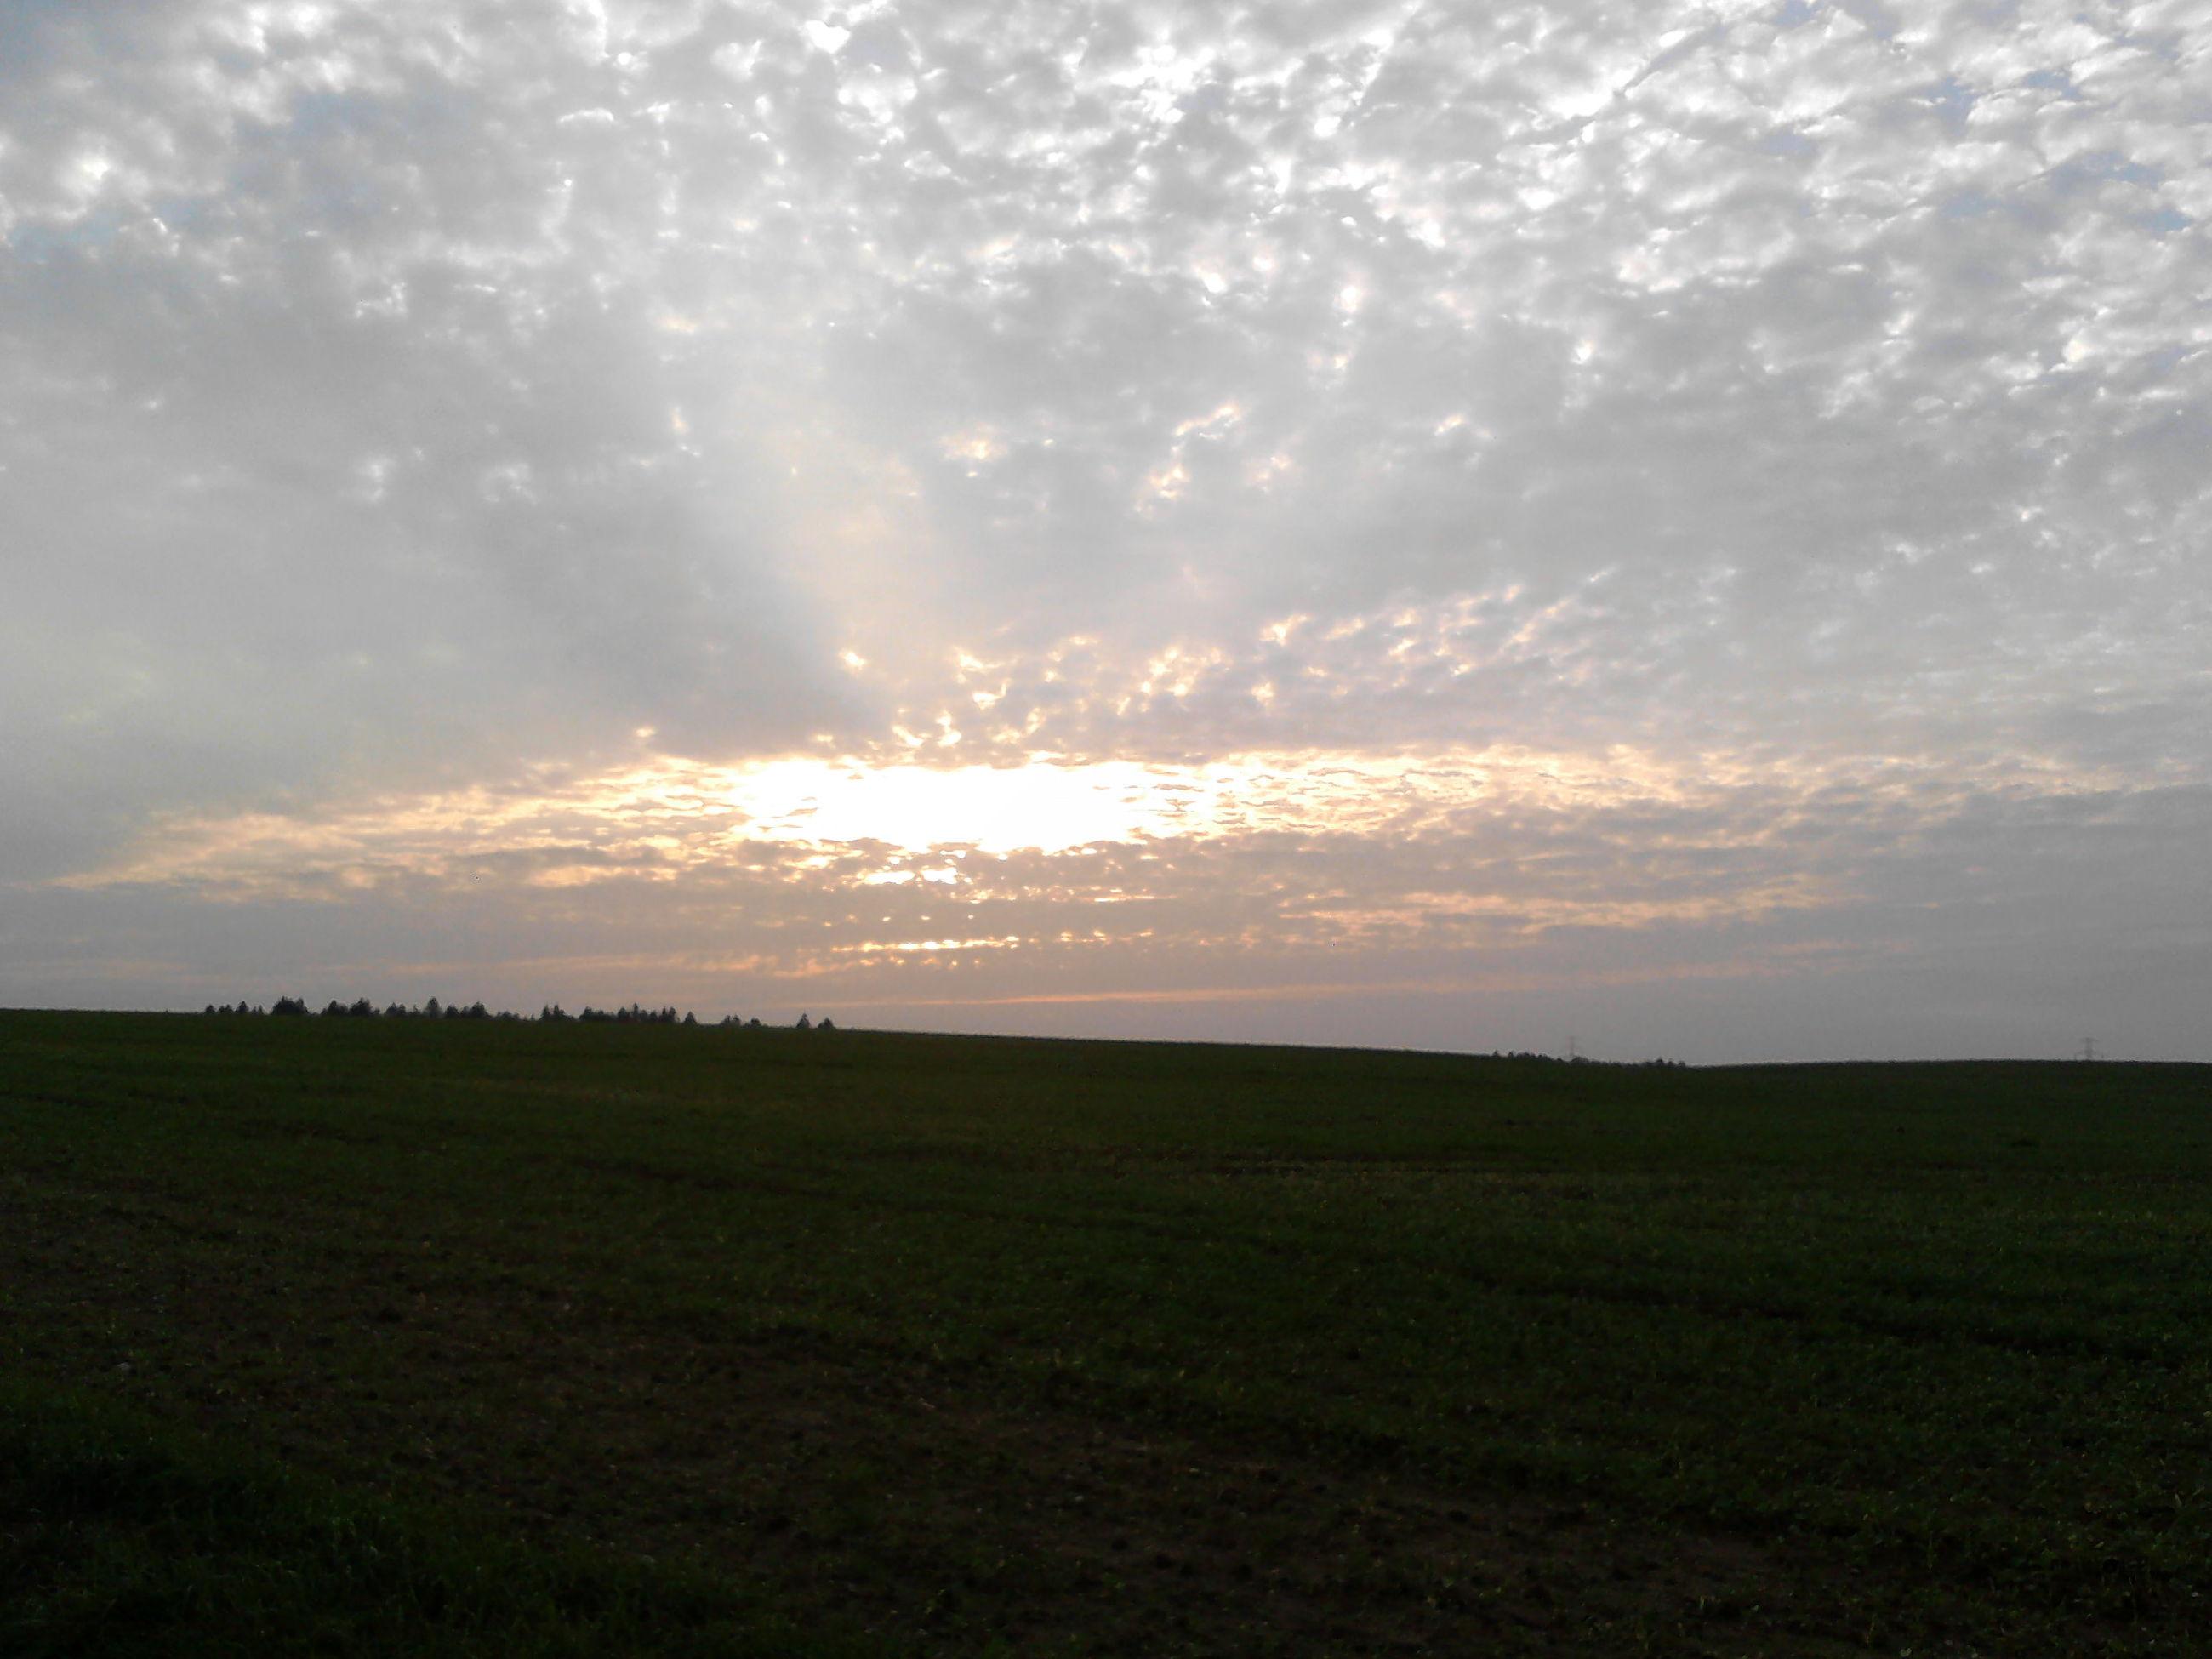 tranquil scene, tranquility, scenics, landscape, sky, sunset, field, beauty in nature, cloud - sky, grass, nature, sun, idyllic, cloudy, cloud, grassy, horizon over land, rural scene, sunlight, outdoors